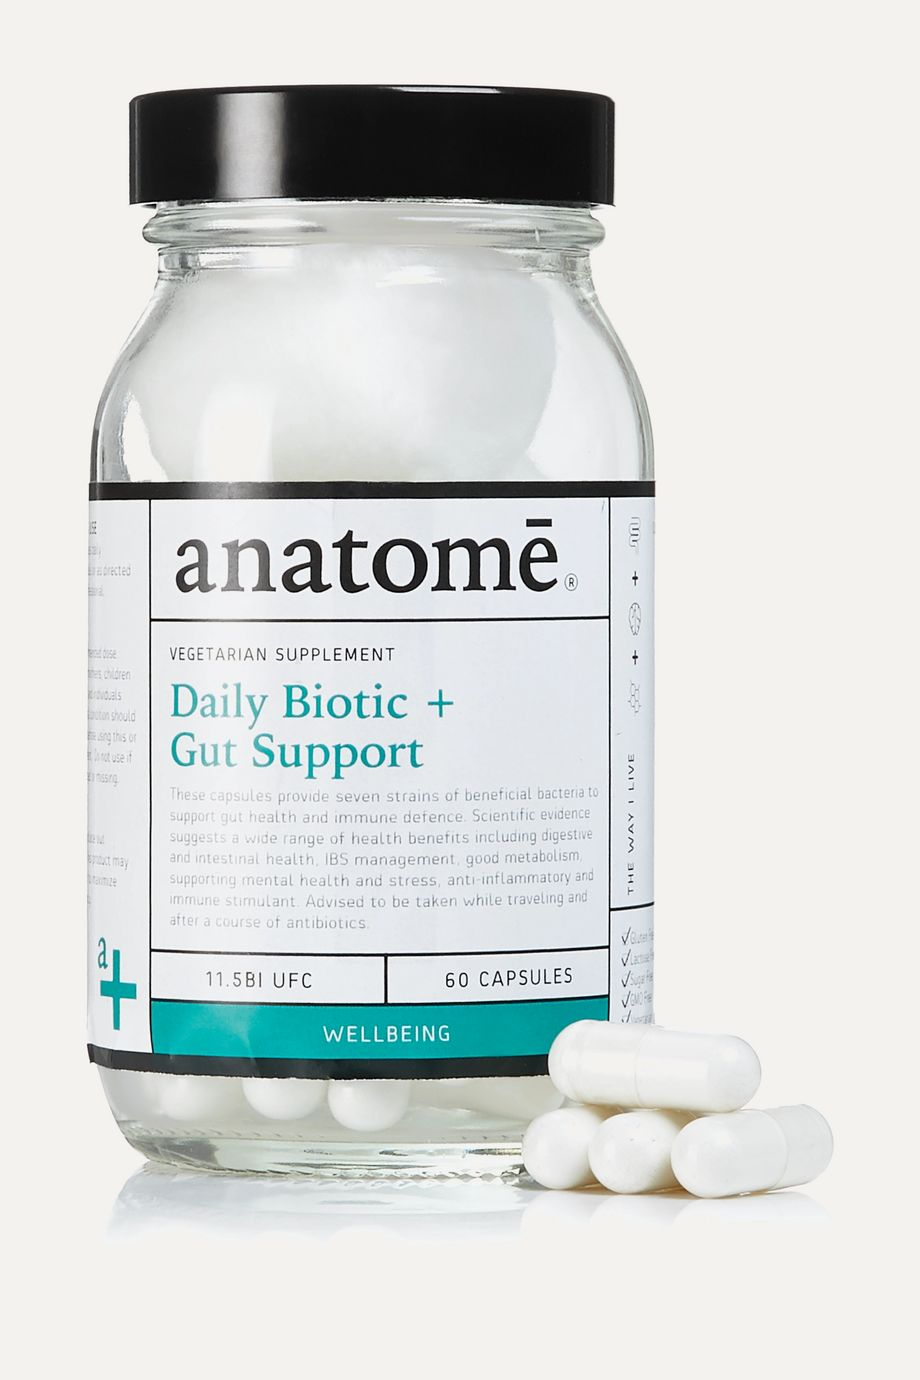 anatomē Vegan Food Supplement - Probiotic + Gut Health (60 capsules)